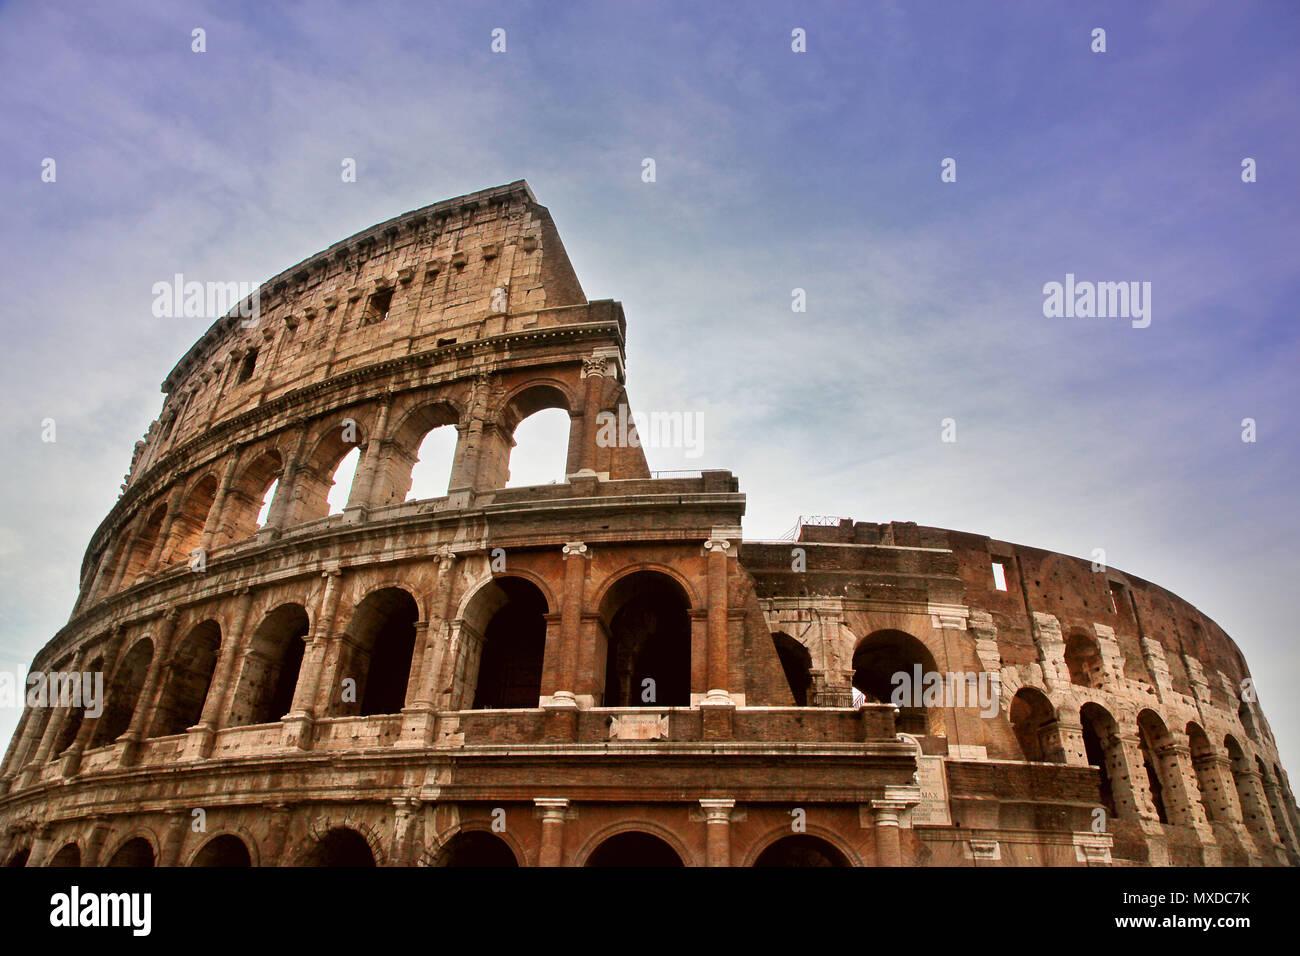 Berühmten römischen Kolosseum vor blauem Himmel am frühen Morgen Stockbild